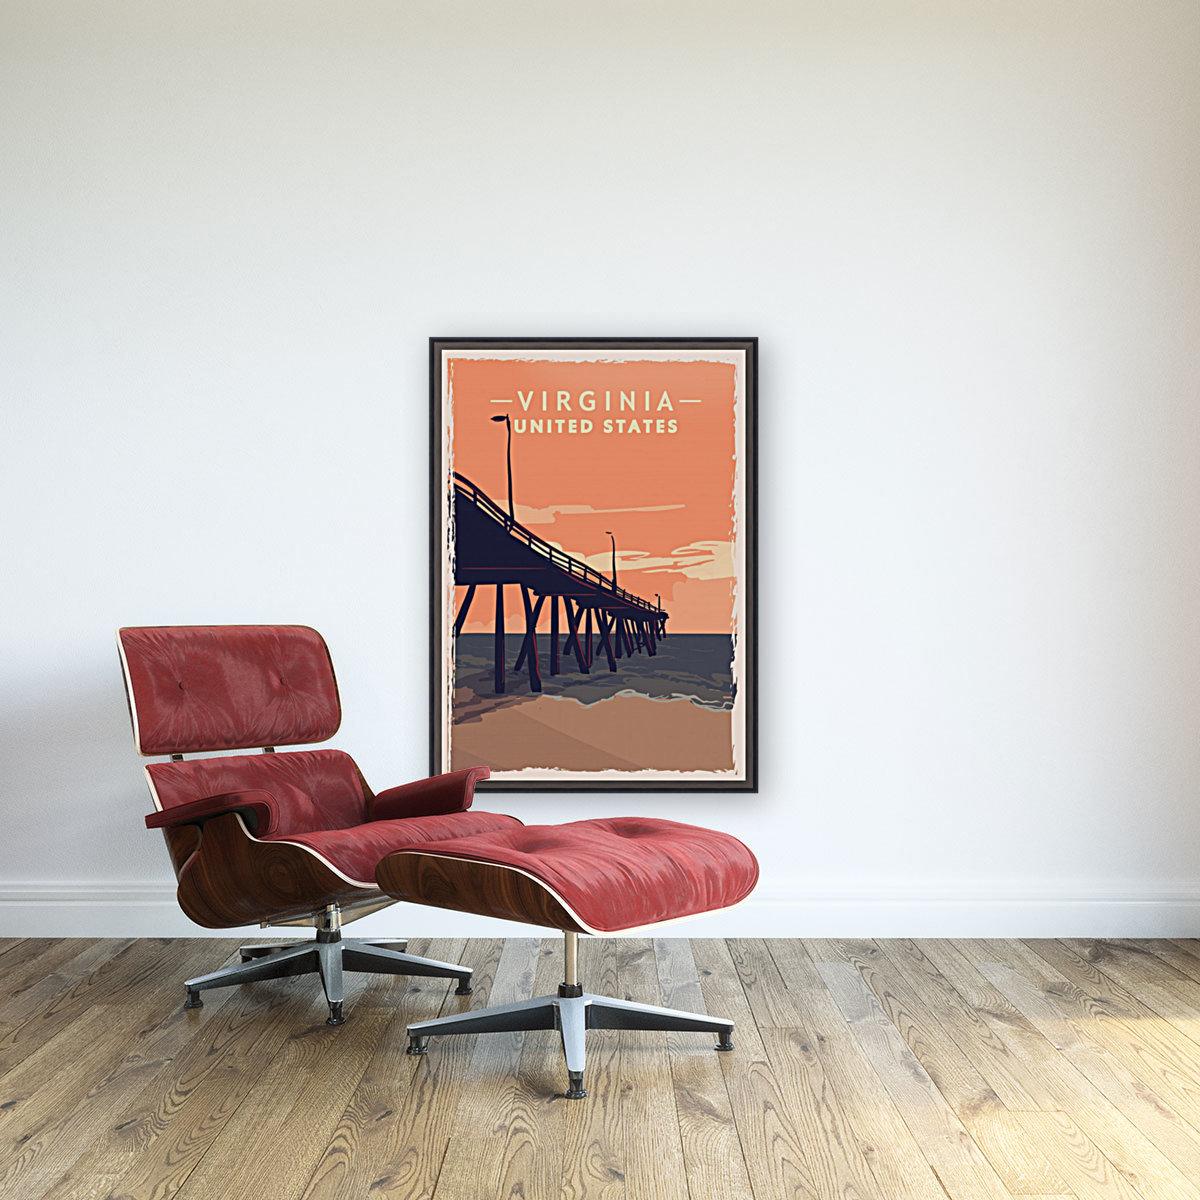 virginia retro poster usa virginia travel illustration united states america  Art